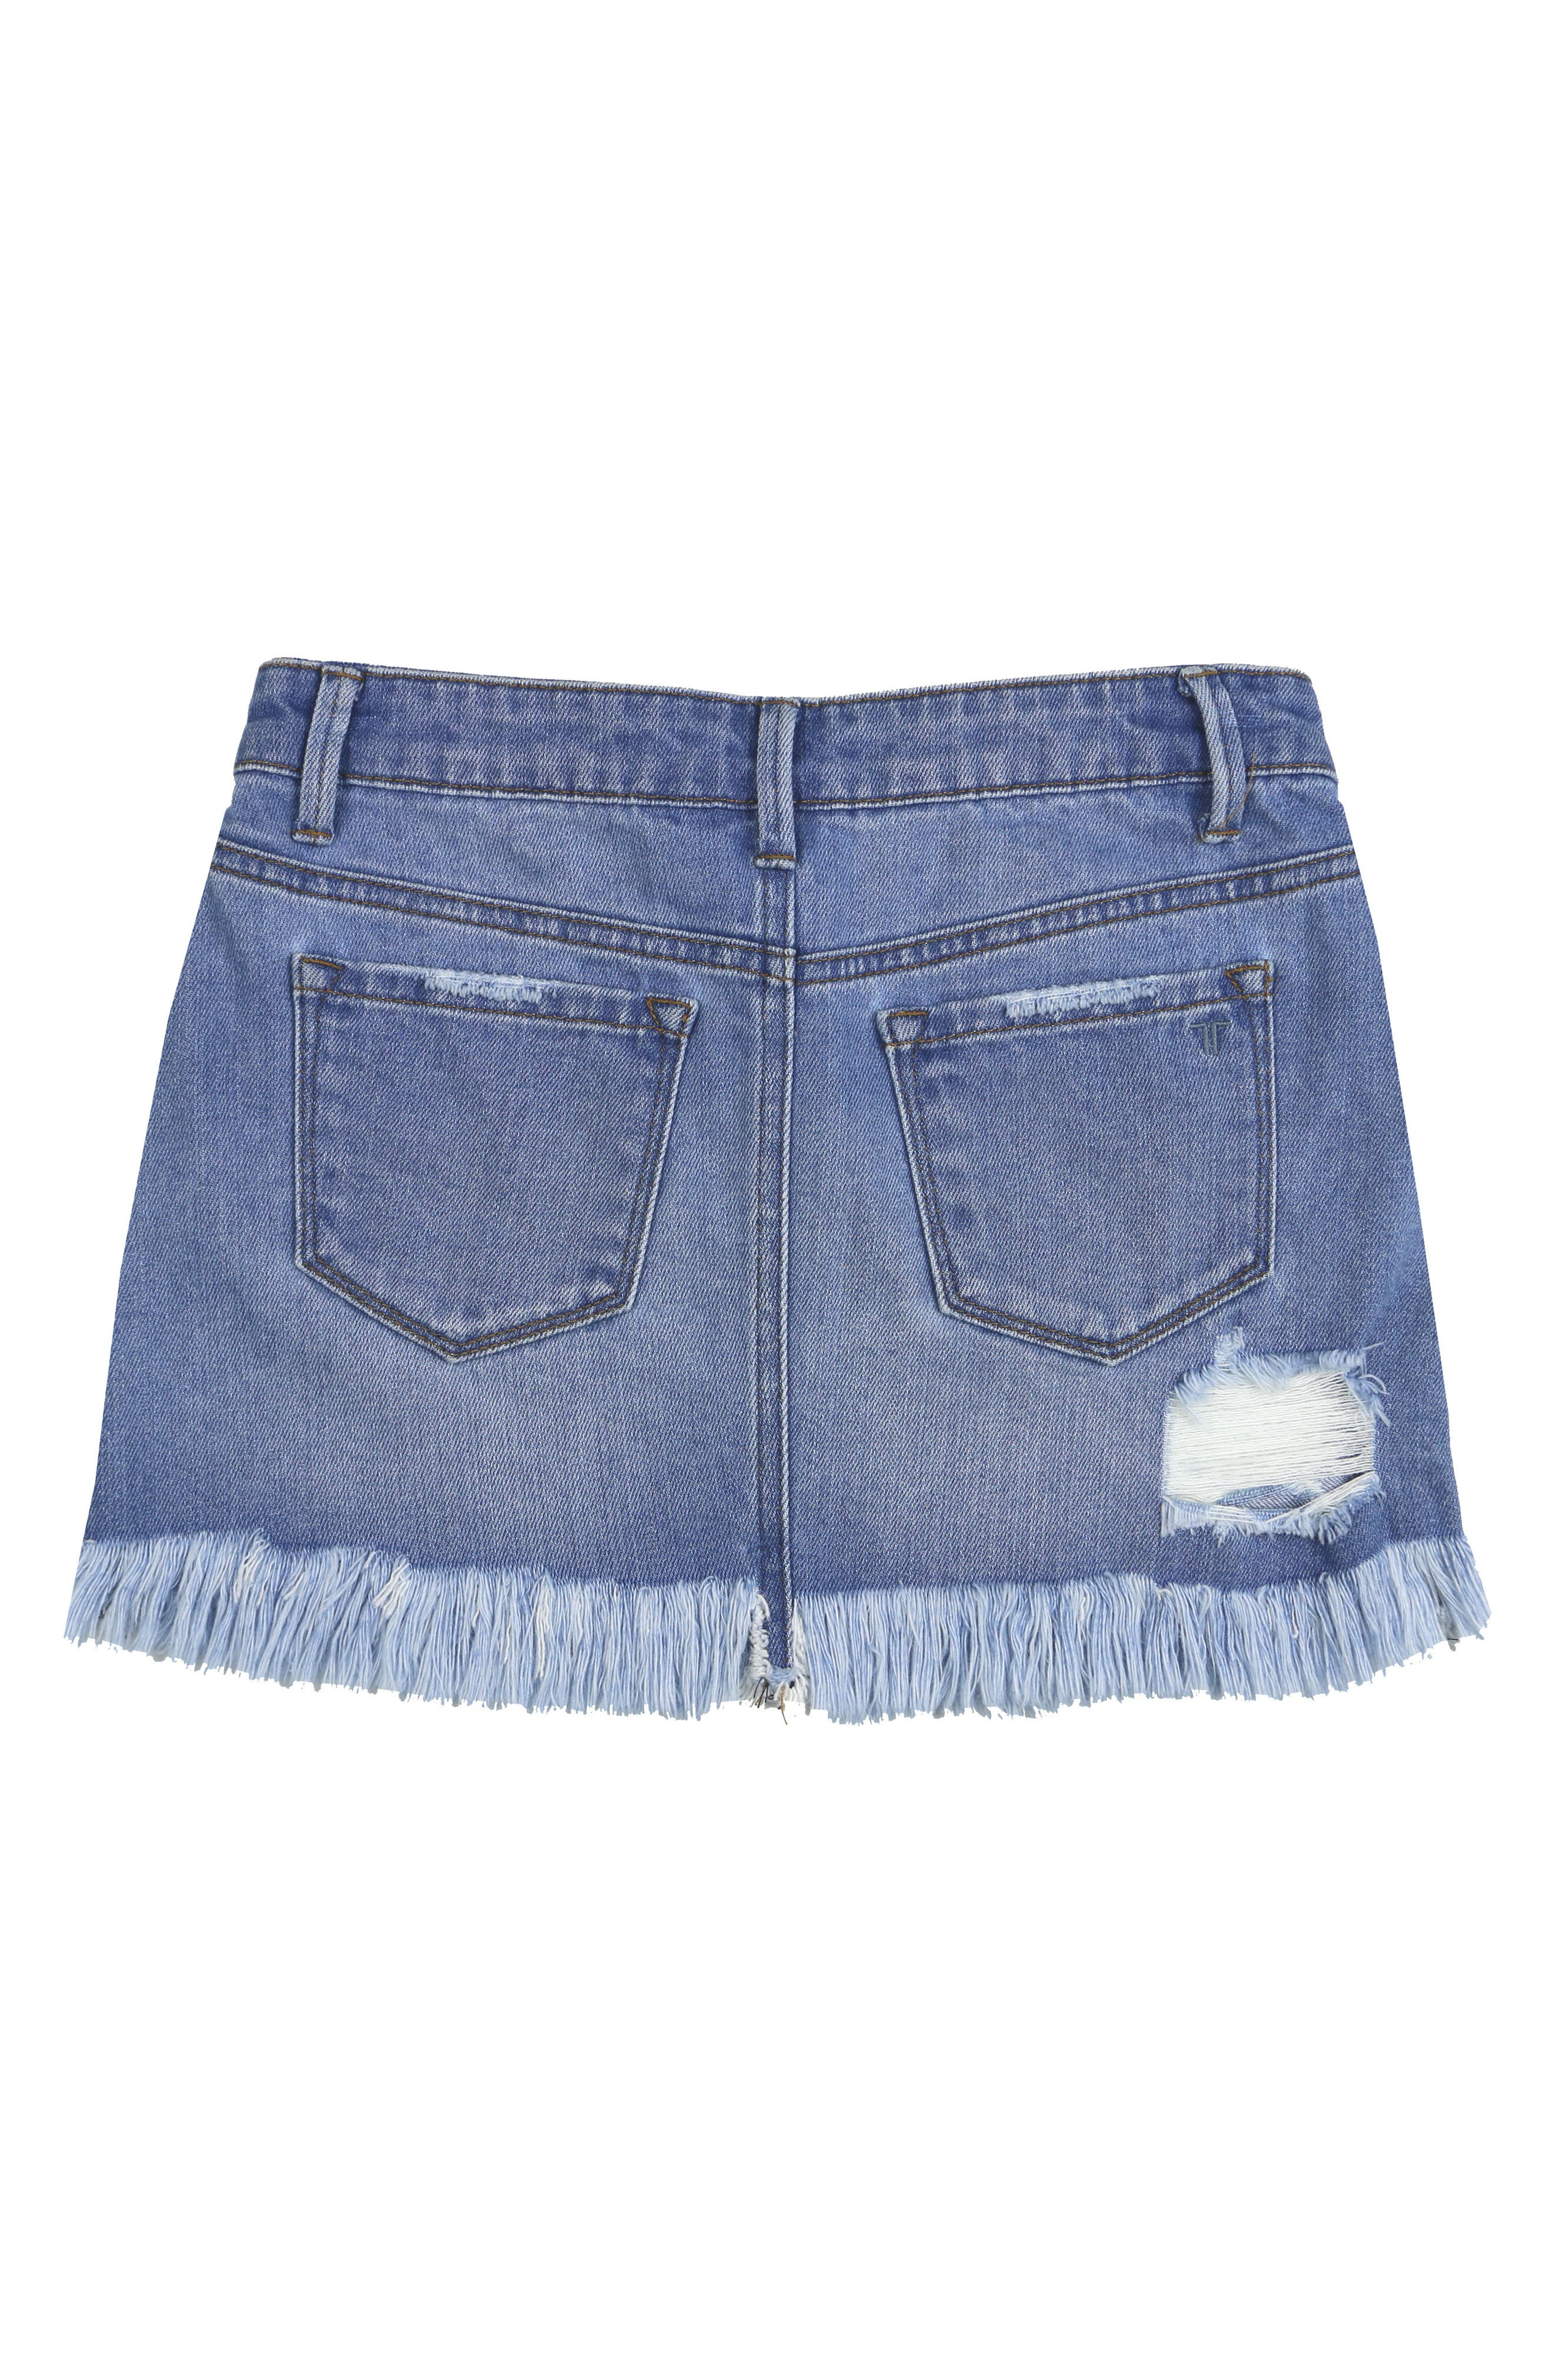 Alternate Image 2  - Tractr Distressed Denim Skirt (Big Girls)